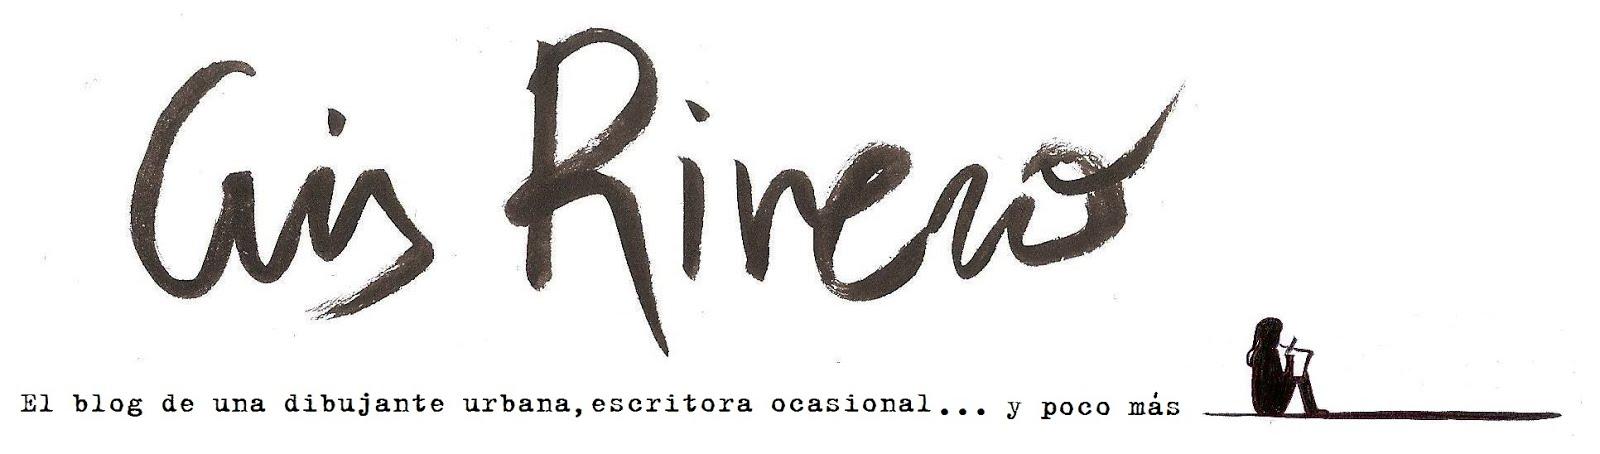 Cris Rivero